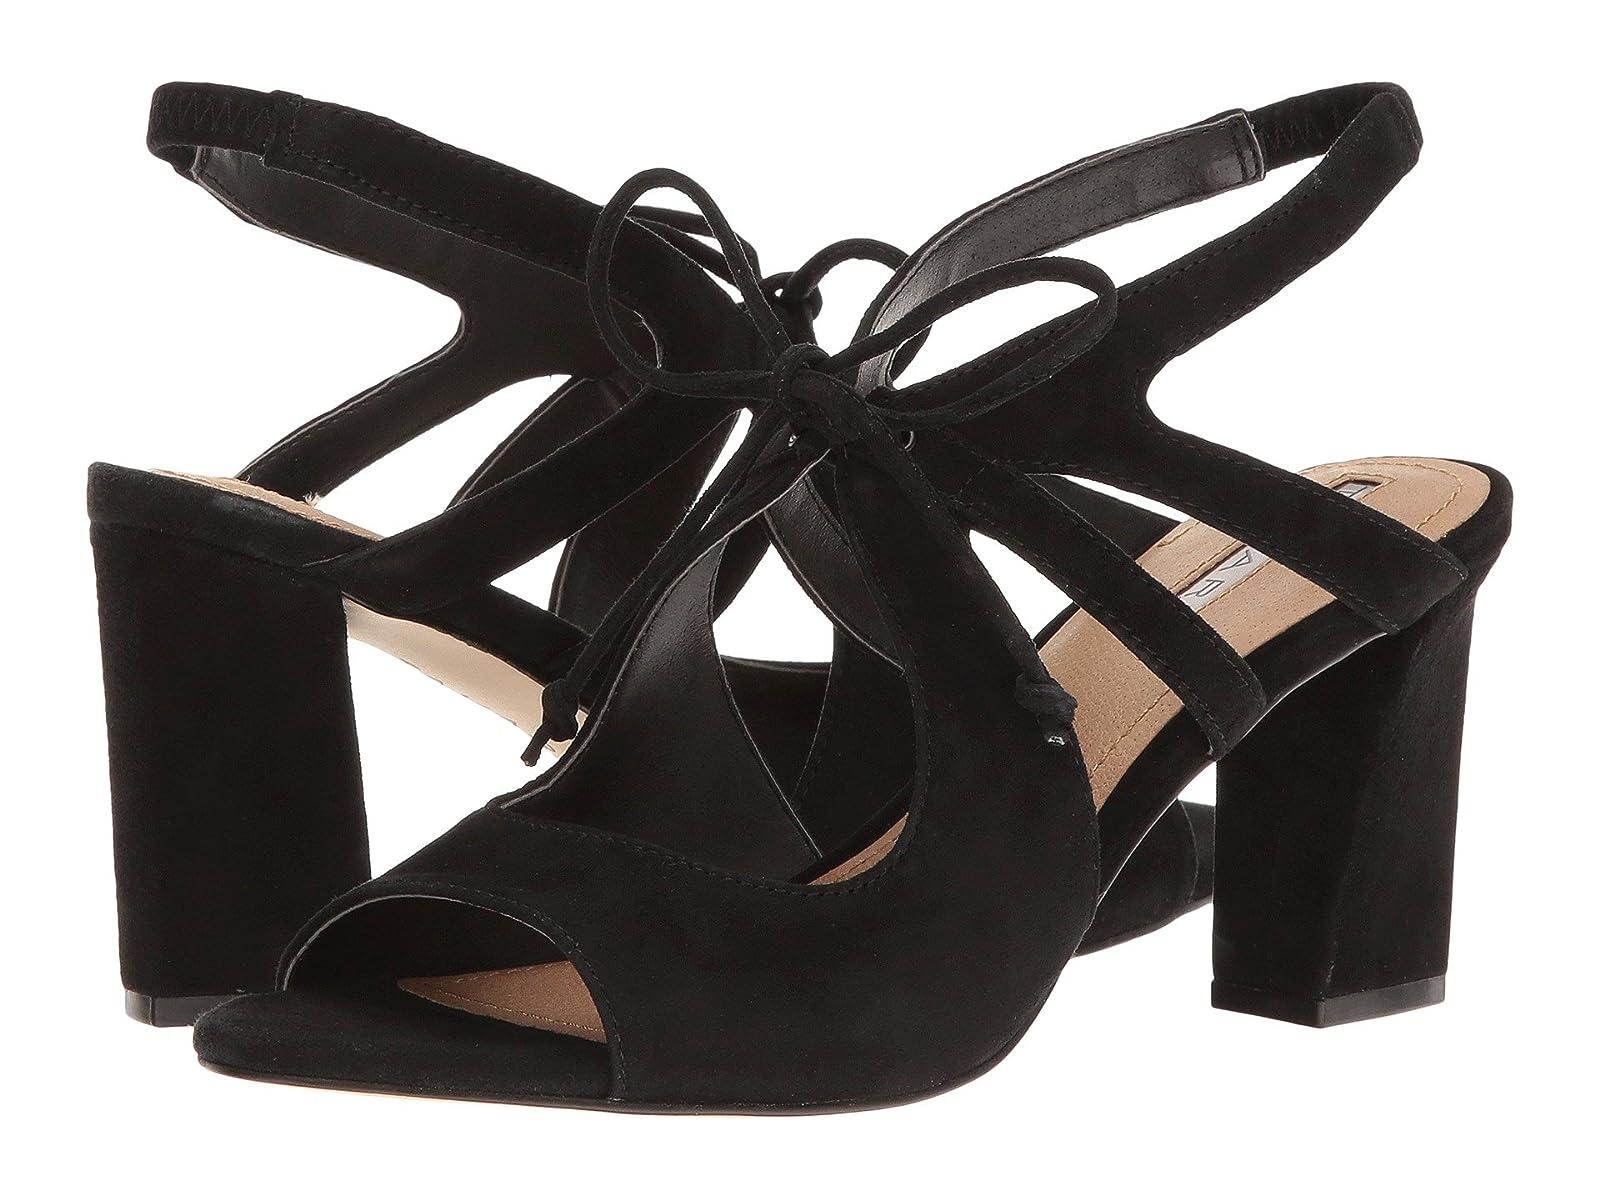 Tahari NightCheap and distinctive eye-catching shoes